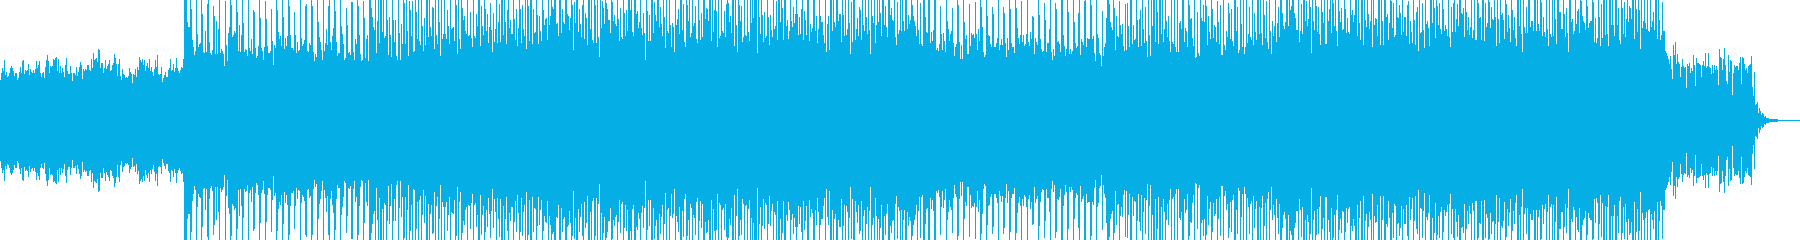 EDMクラブ系ダンスミュージック-124の再生済みの波形